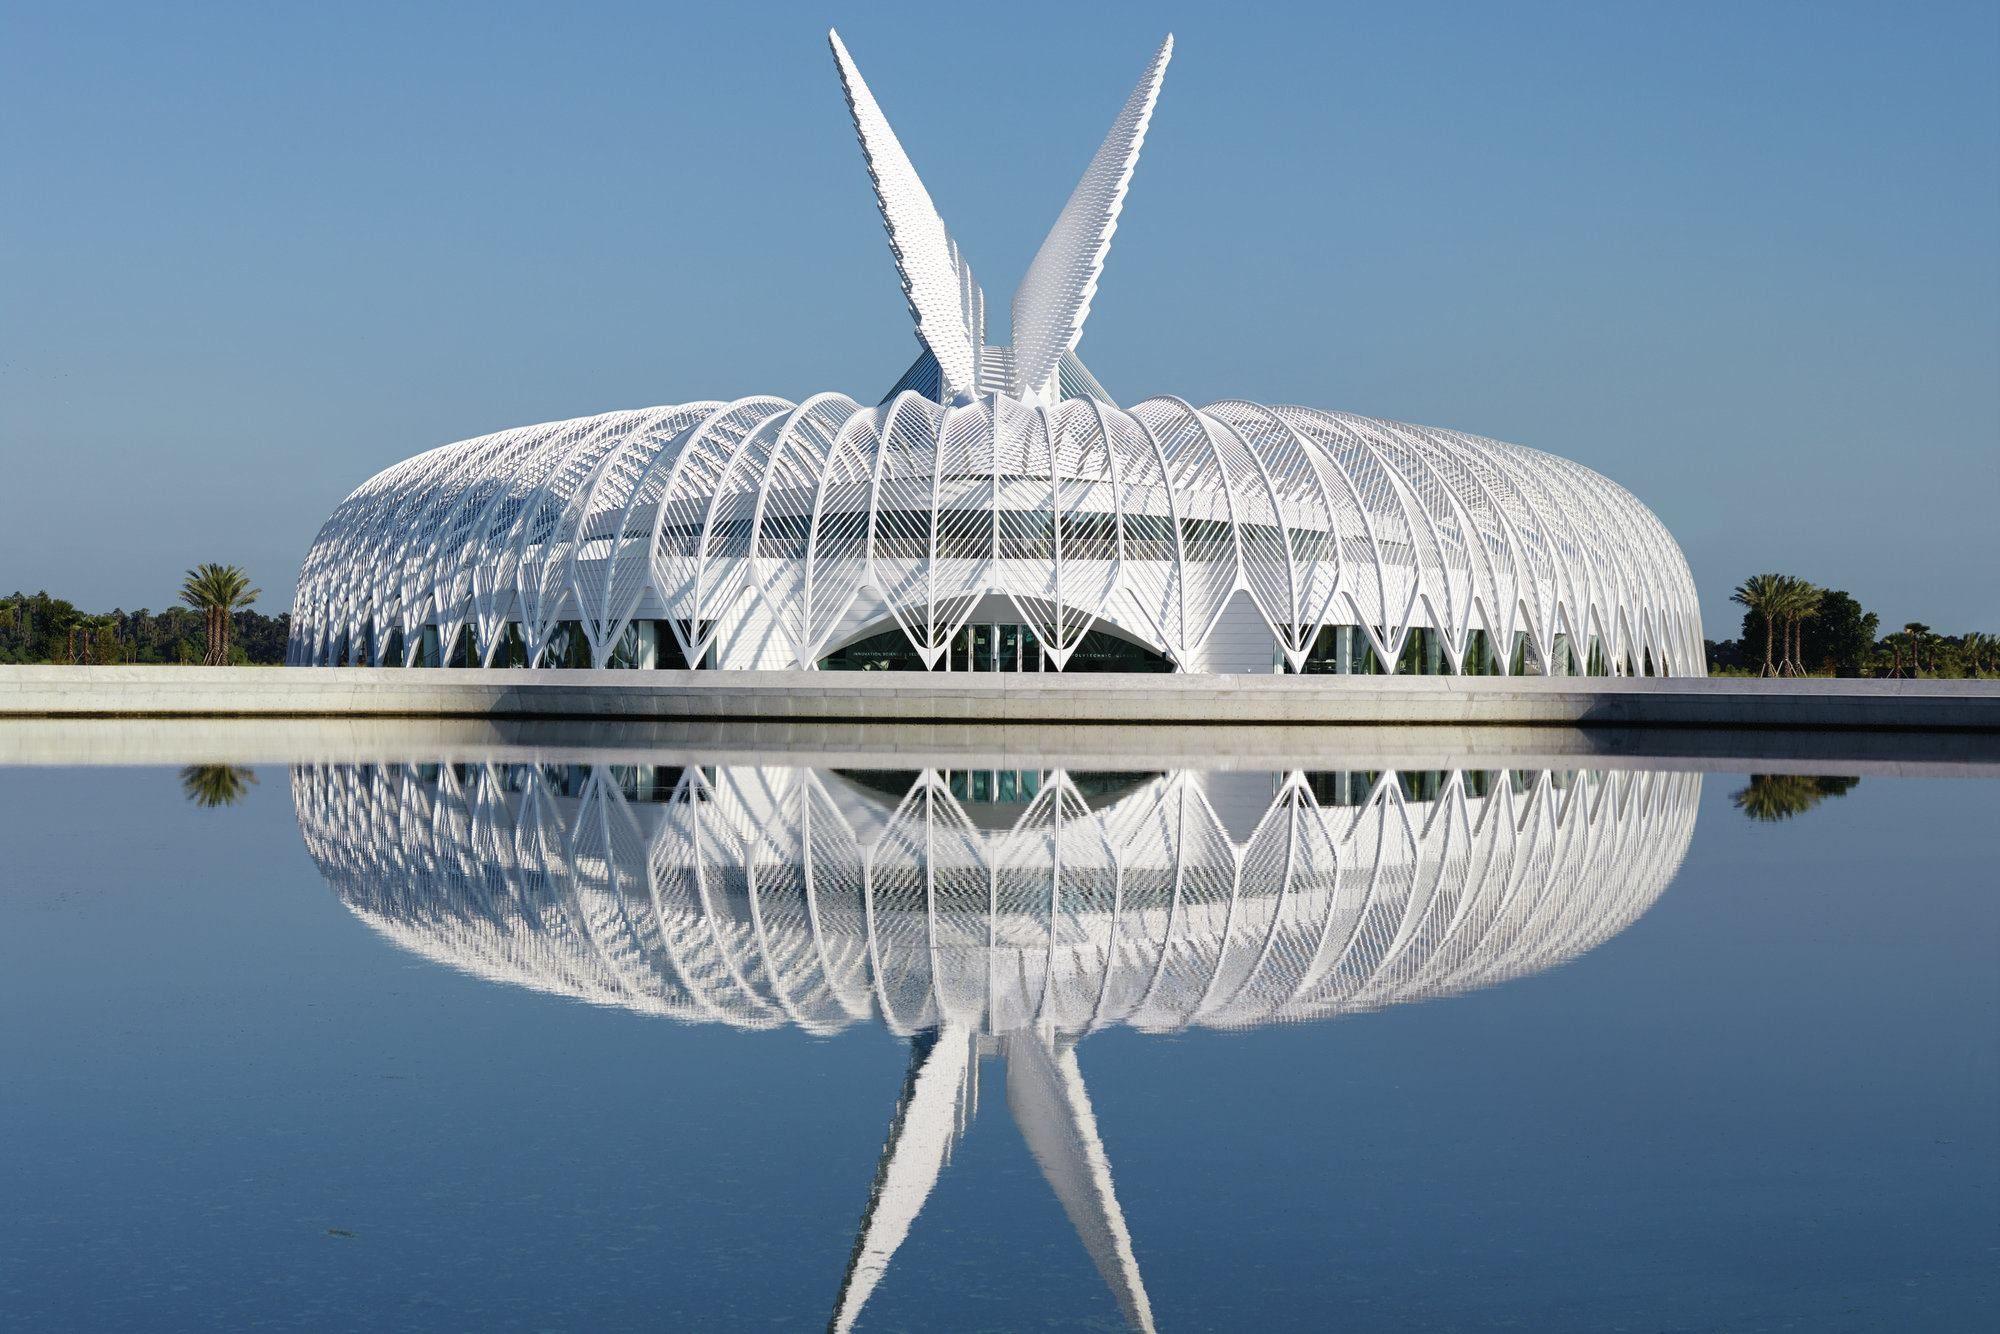 Santiago Calatrava's Innovation, Science and Technology